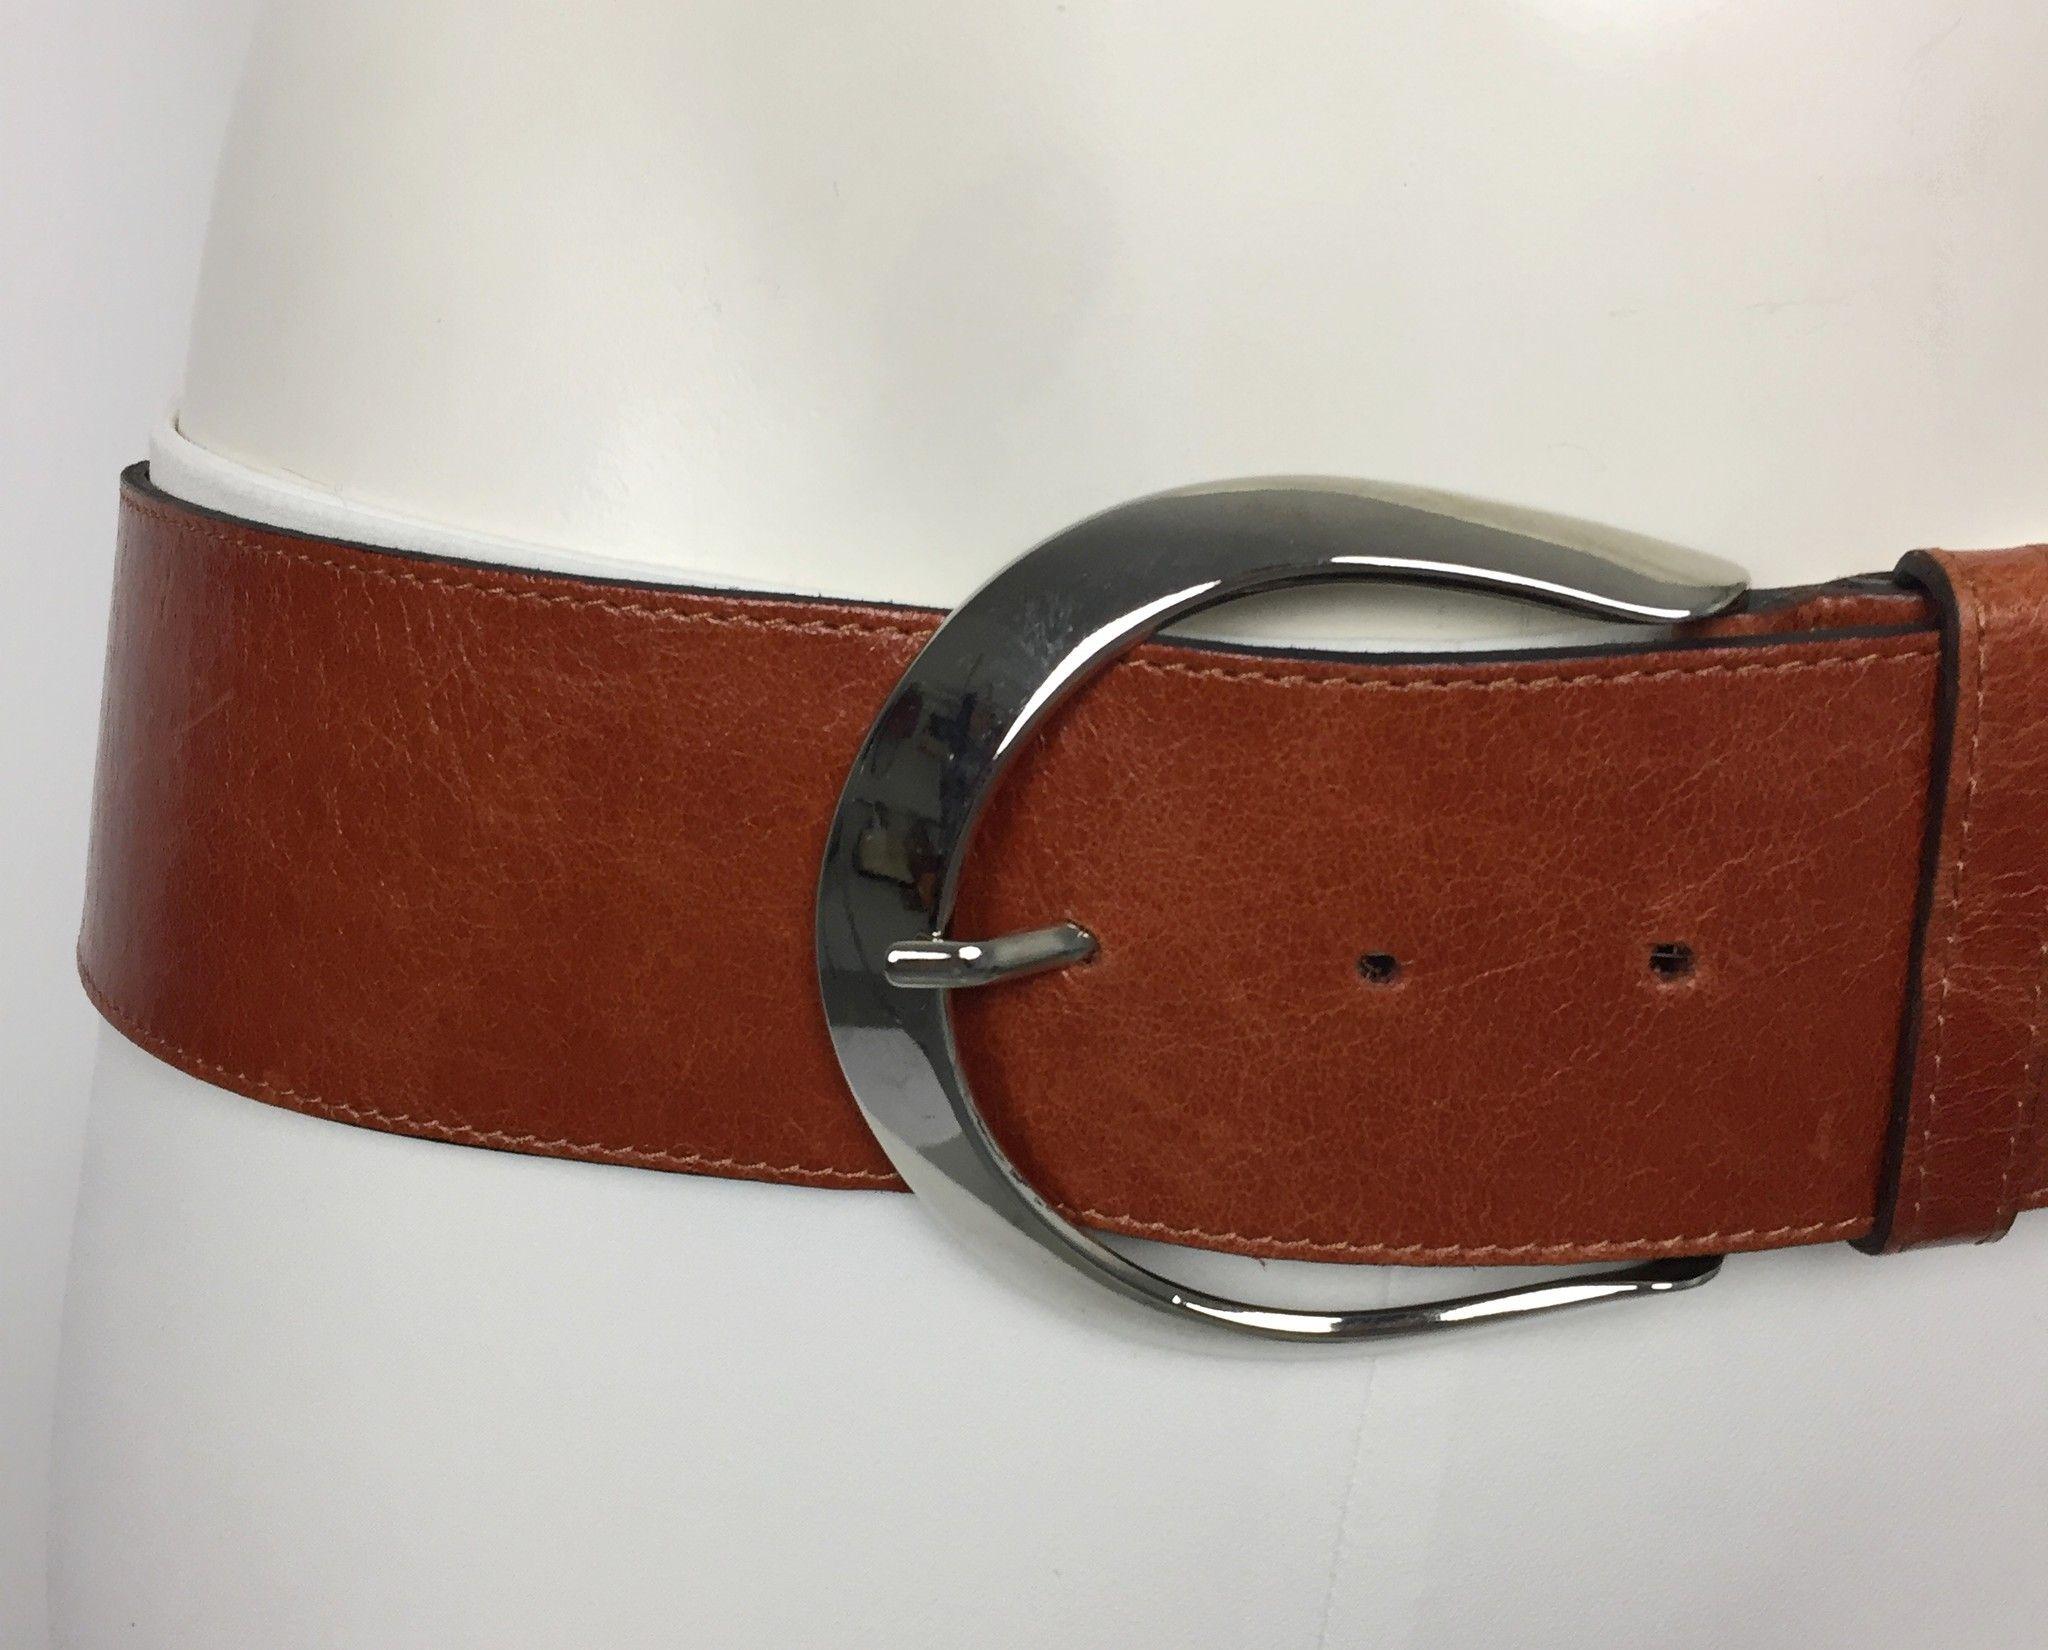 Cintura LadyBug in Vera Pelle con Fibbia Tonda in Acciaio Cod.25784